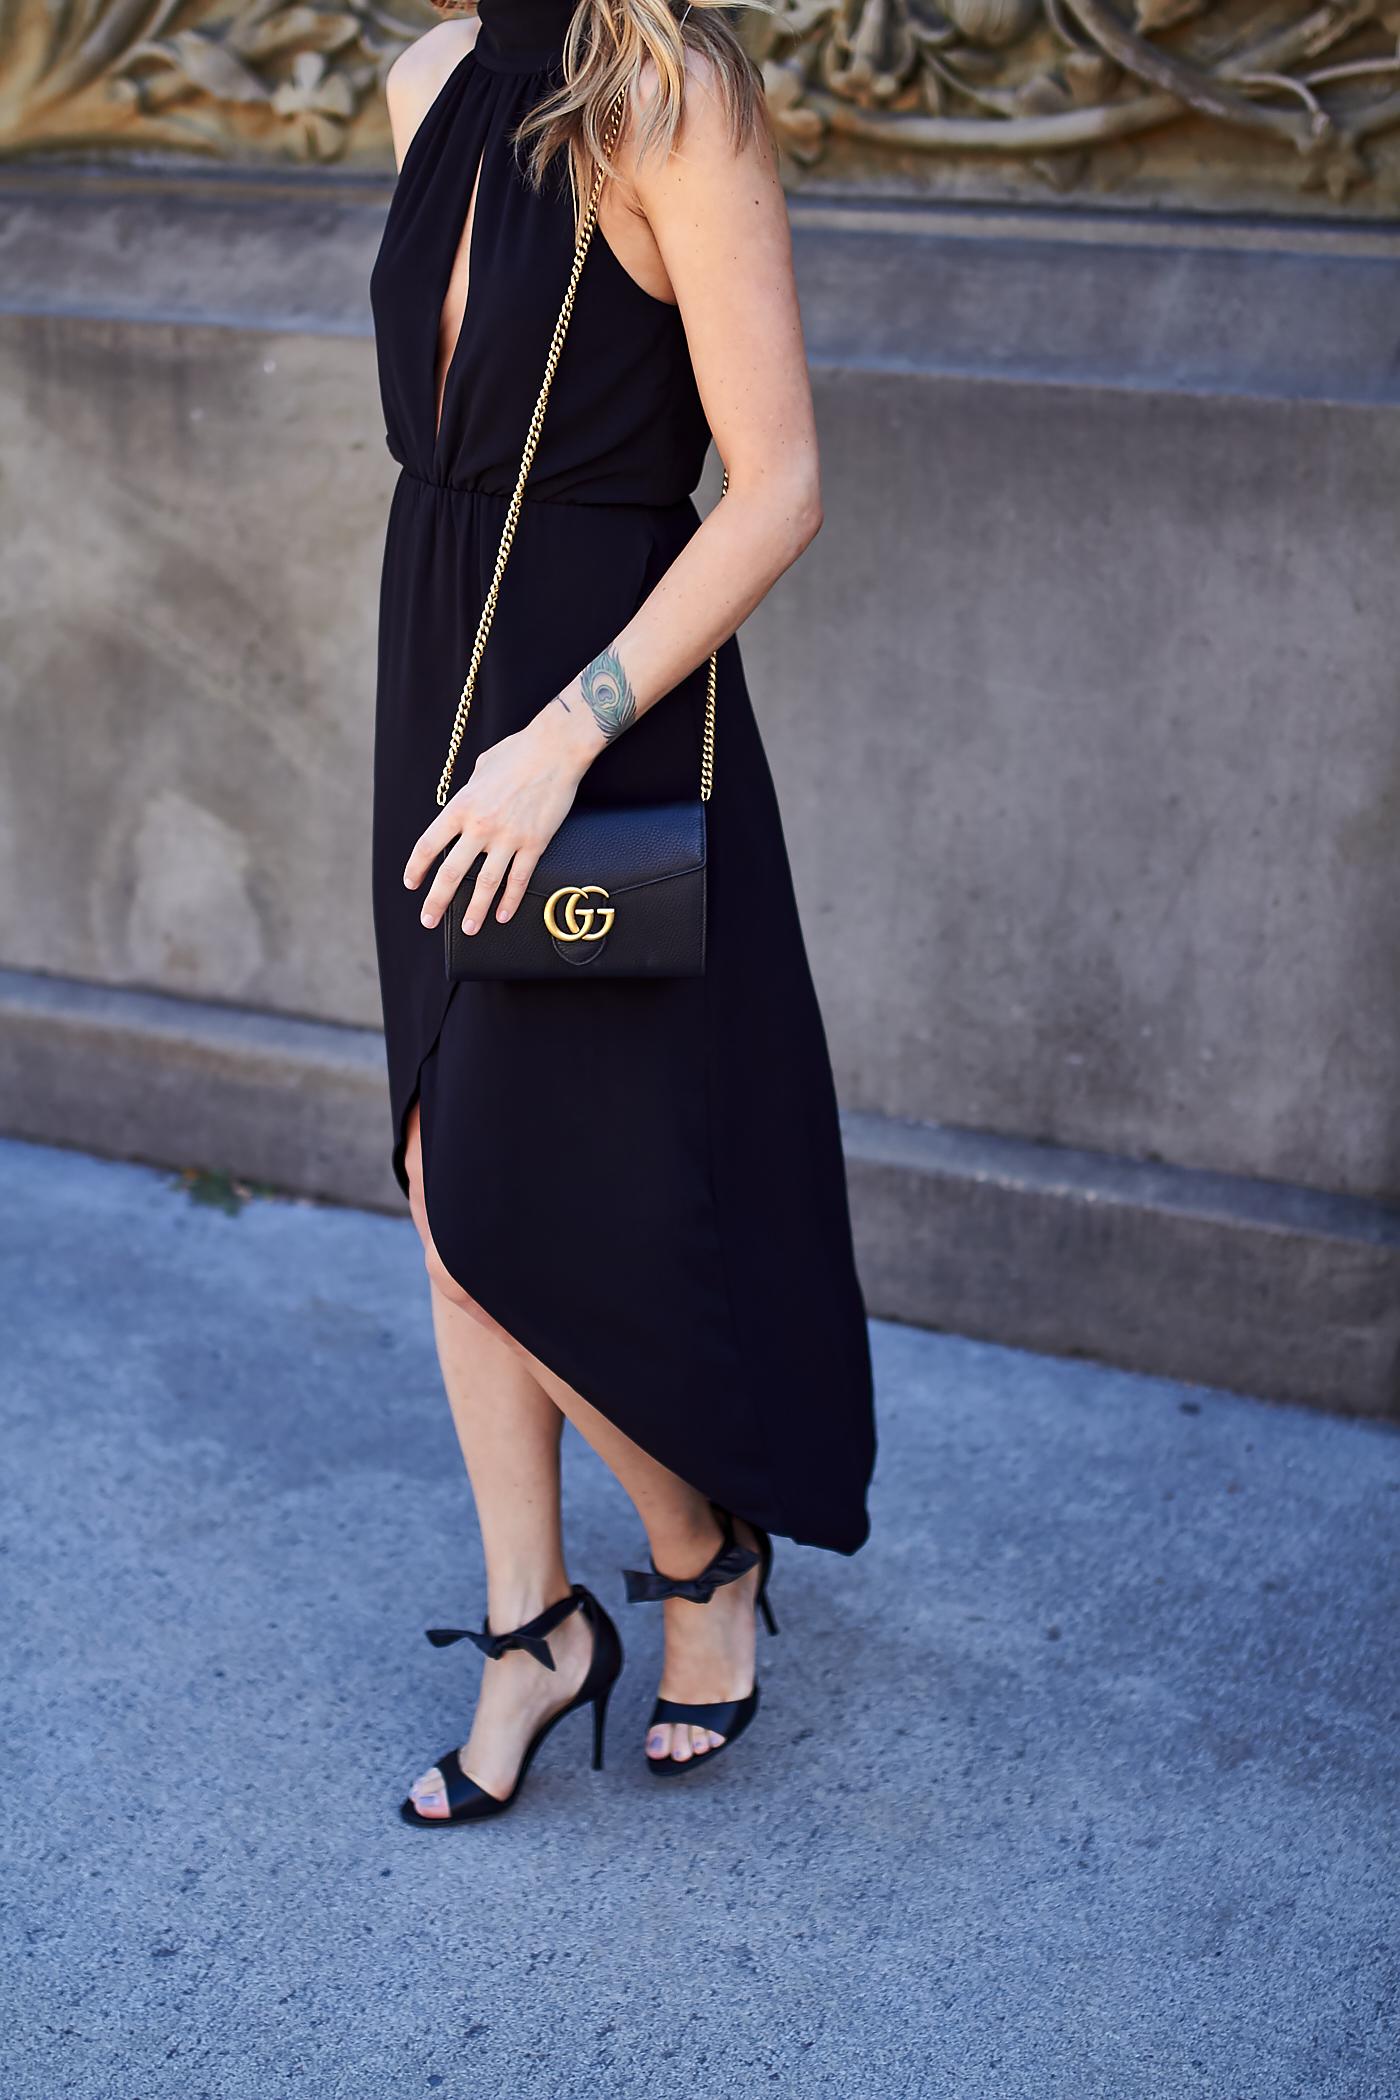 fashion-jackson-gucci-marmont-handbag-steve-madden-bow-heels-black-high-low-hem-dress